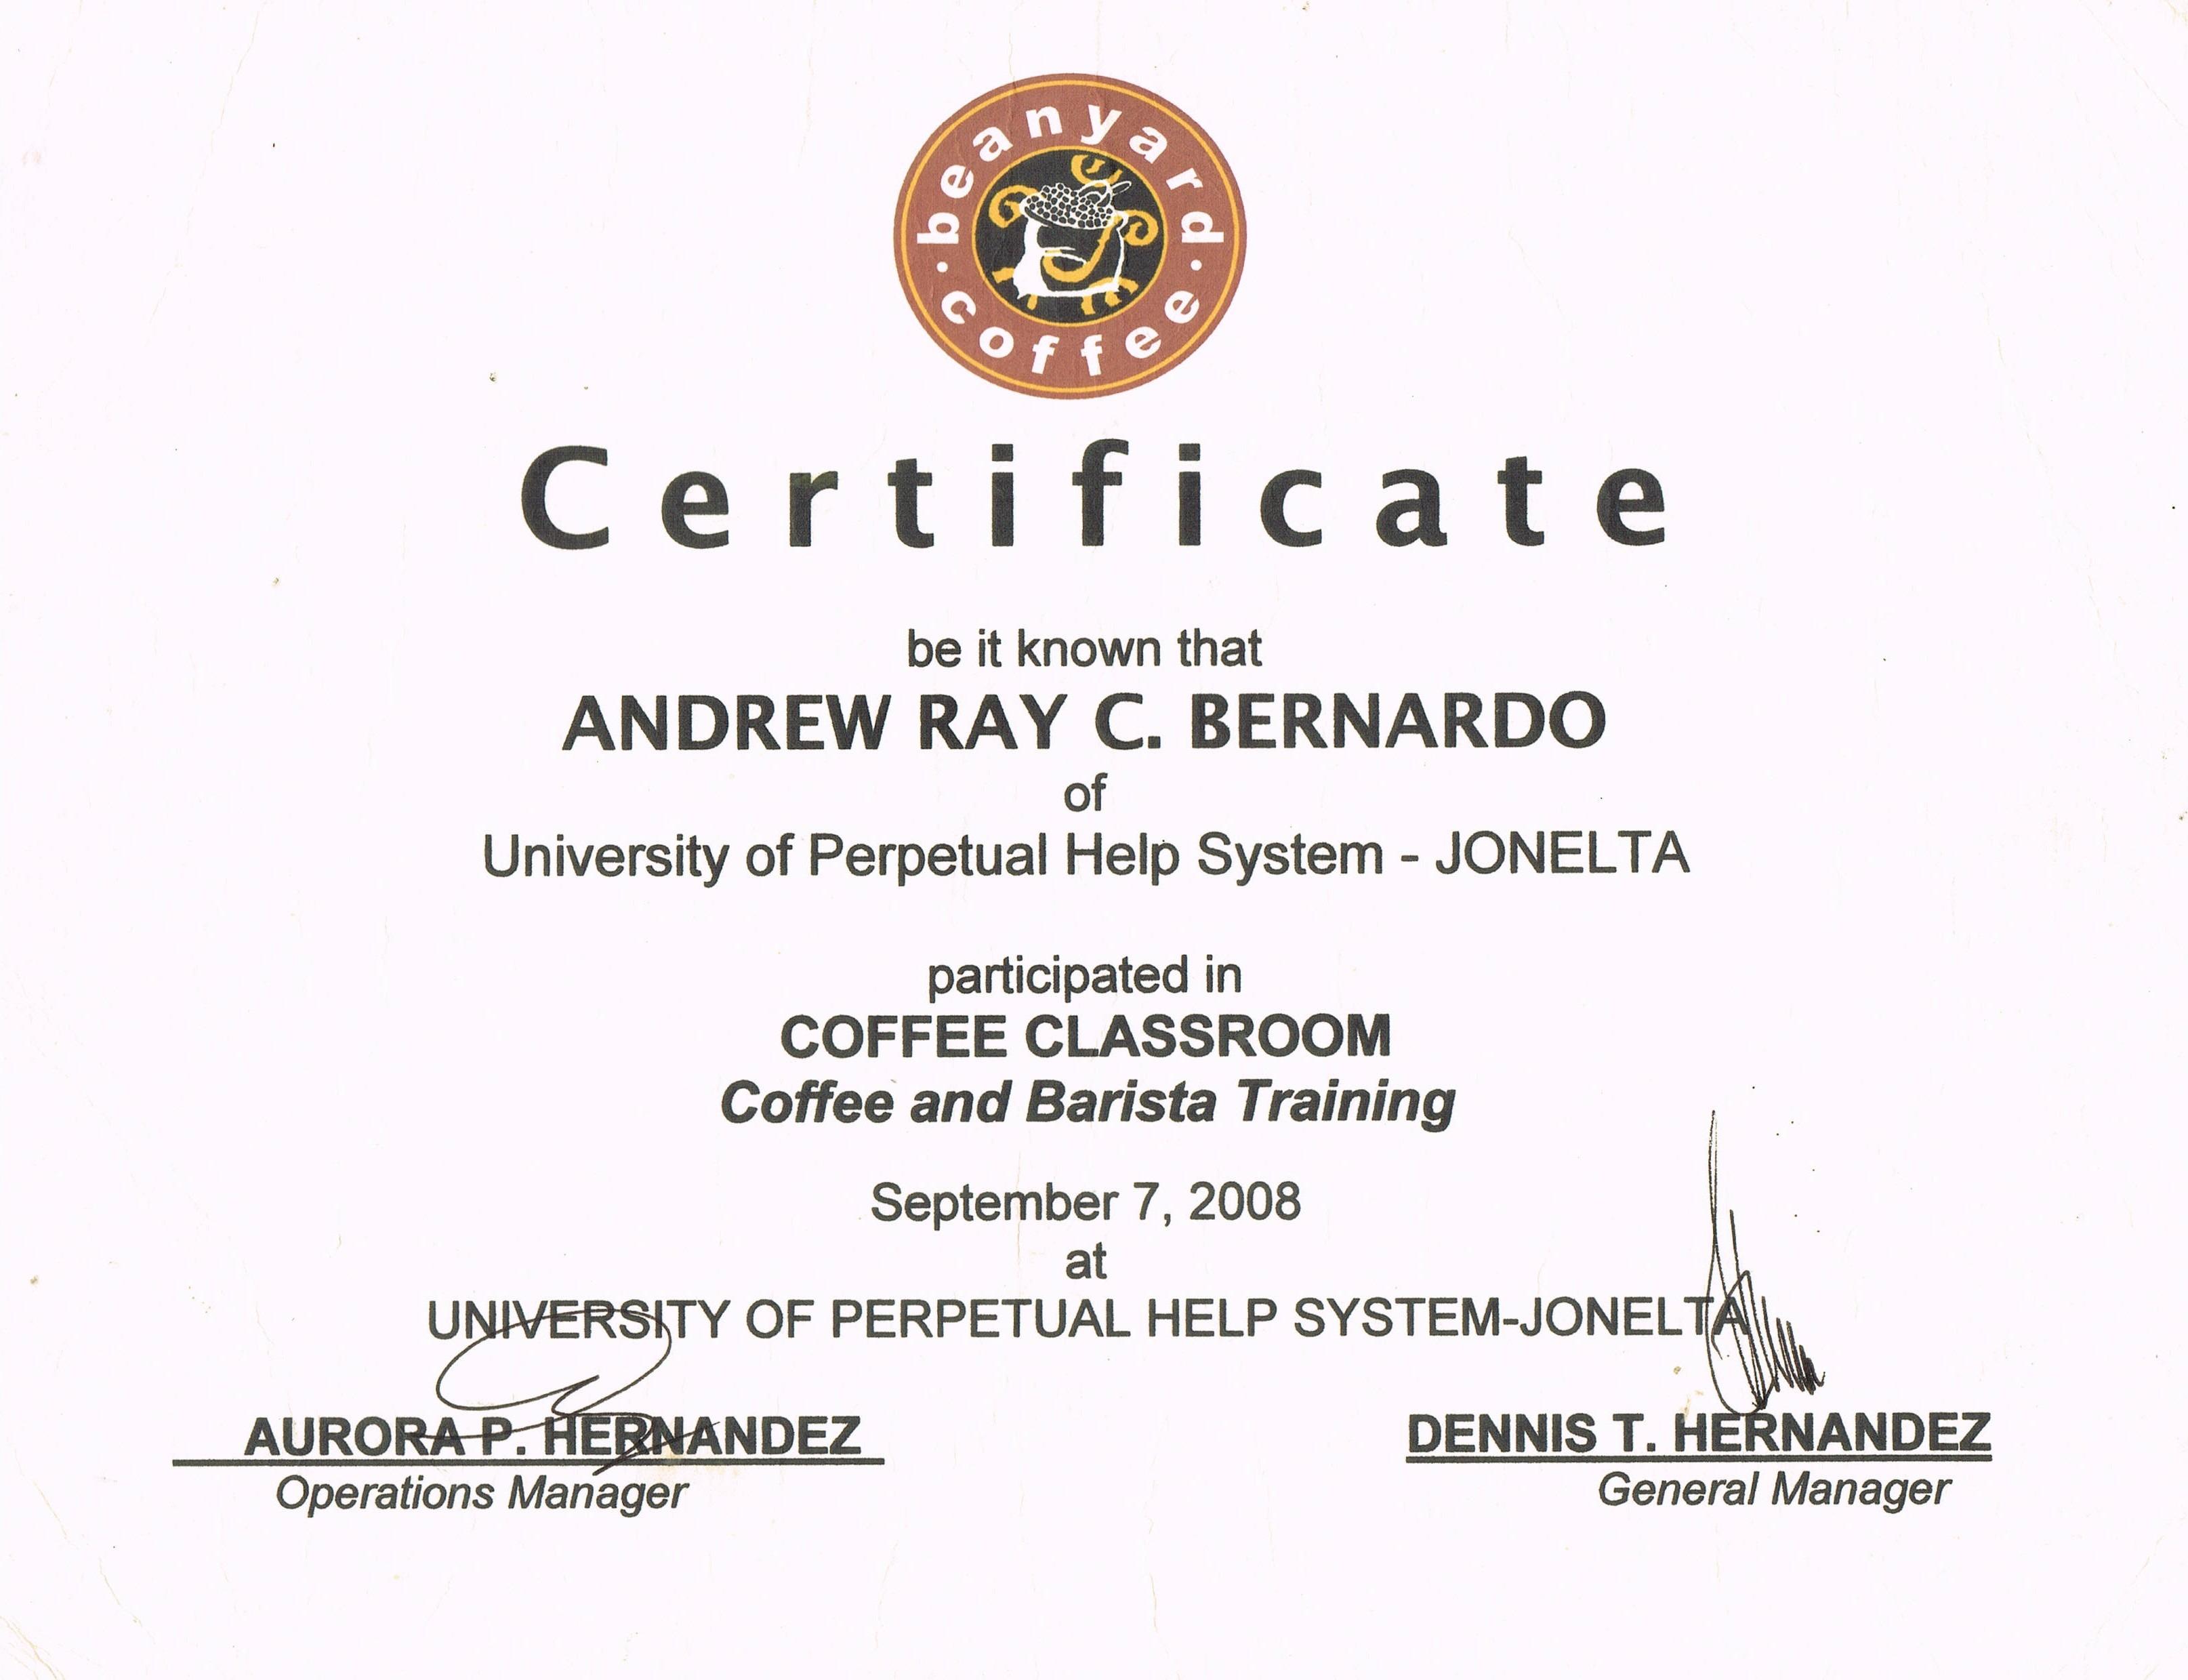 Andrew Ray Bernardo